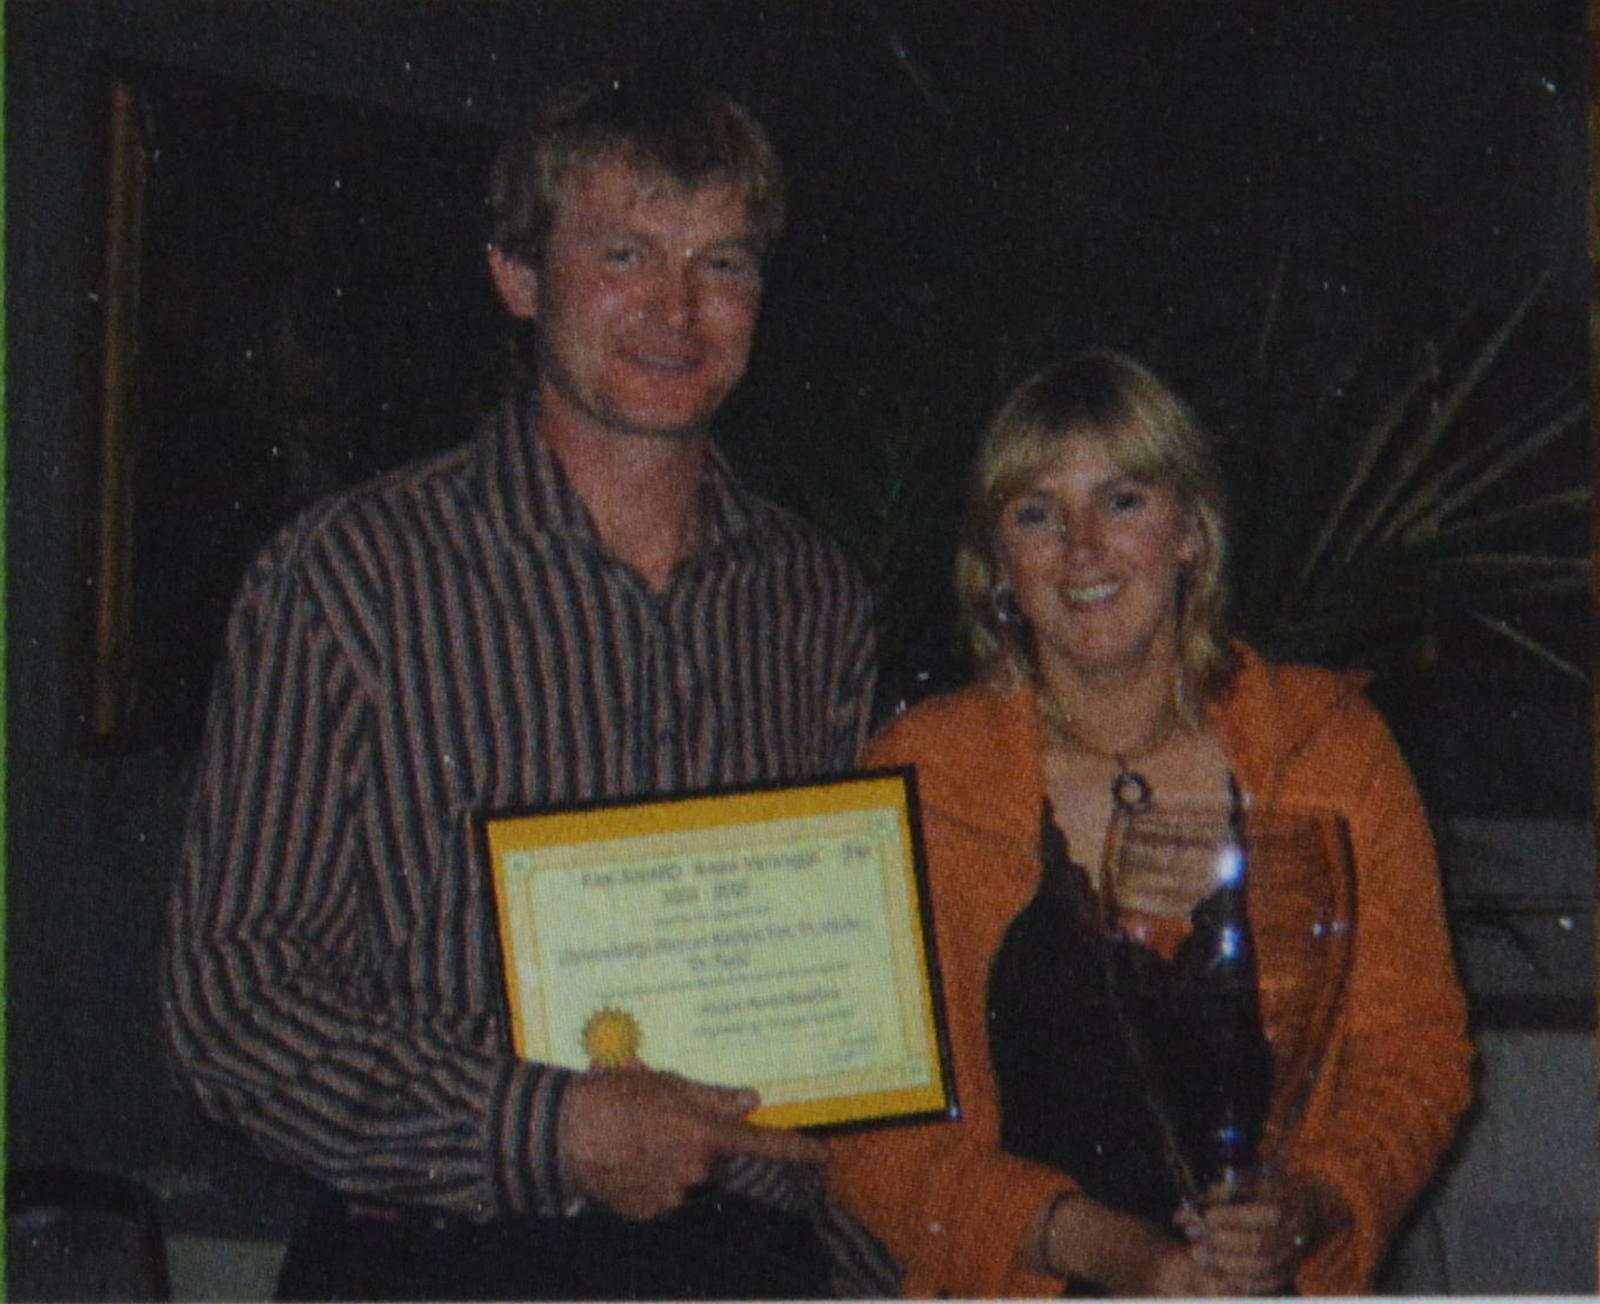 Hans en Katleen PAK award